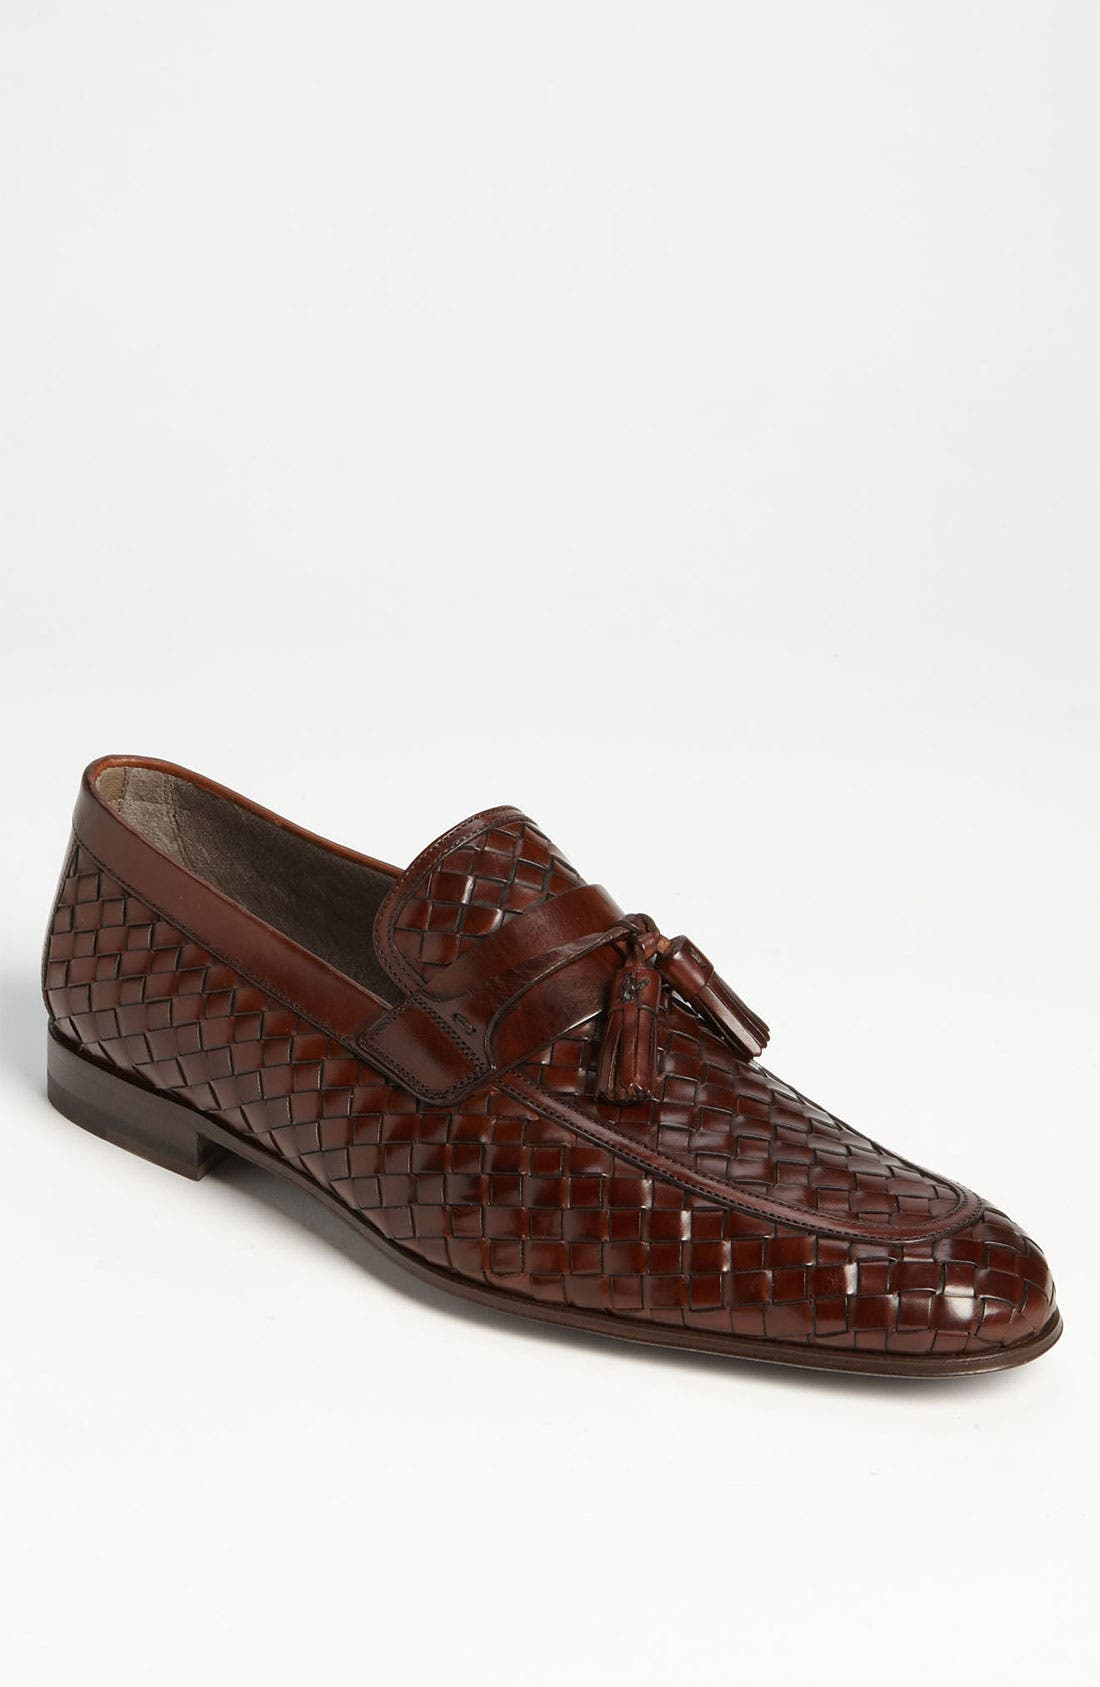 Main Image - Magnanni 'Oscar' Woven Tassel Loafer (Online Only)